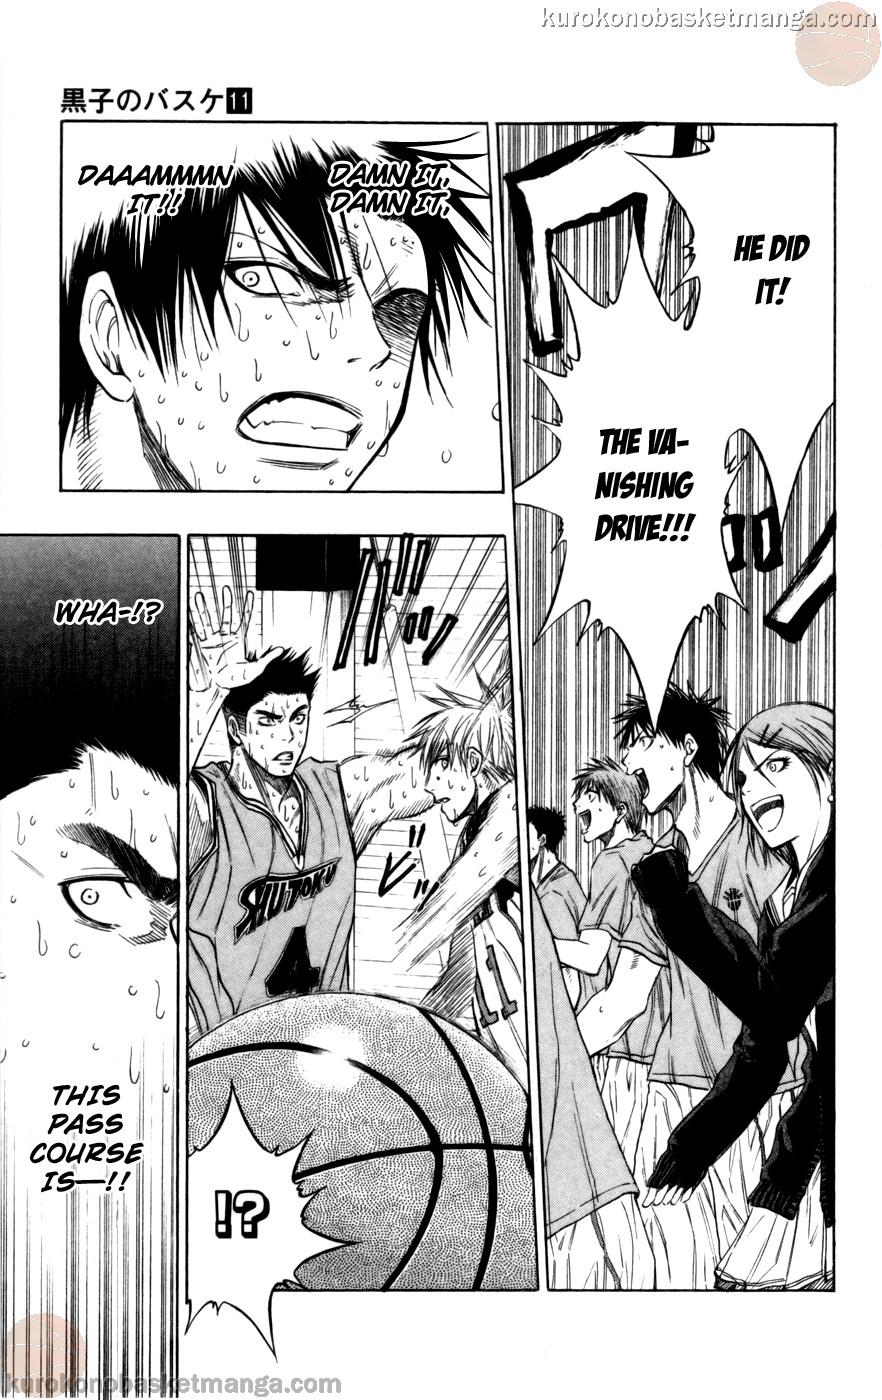 Kuroko no Basket Manga Chapter 91 - Image 19